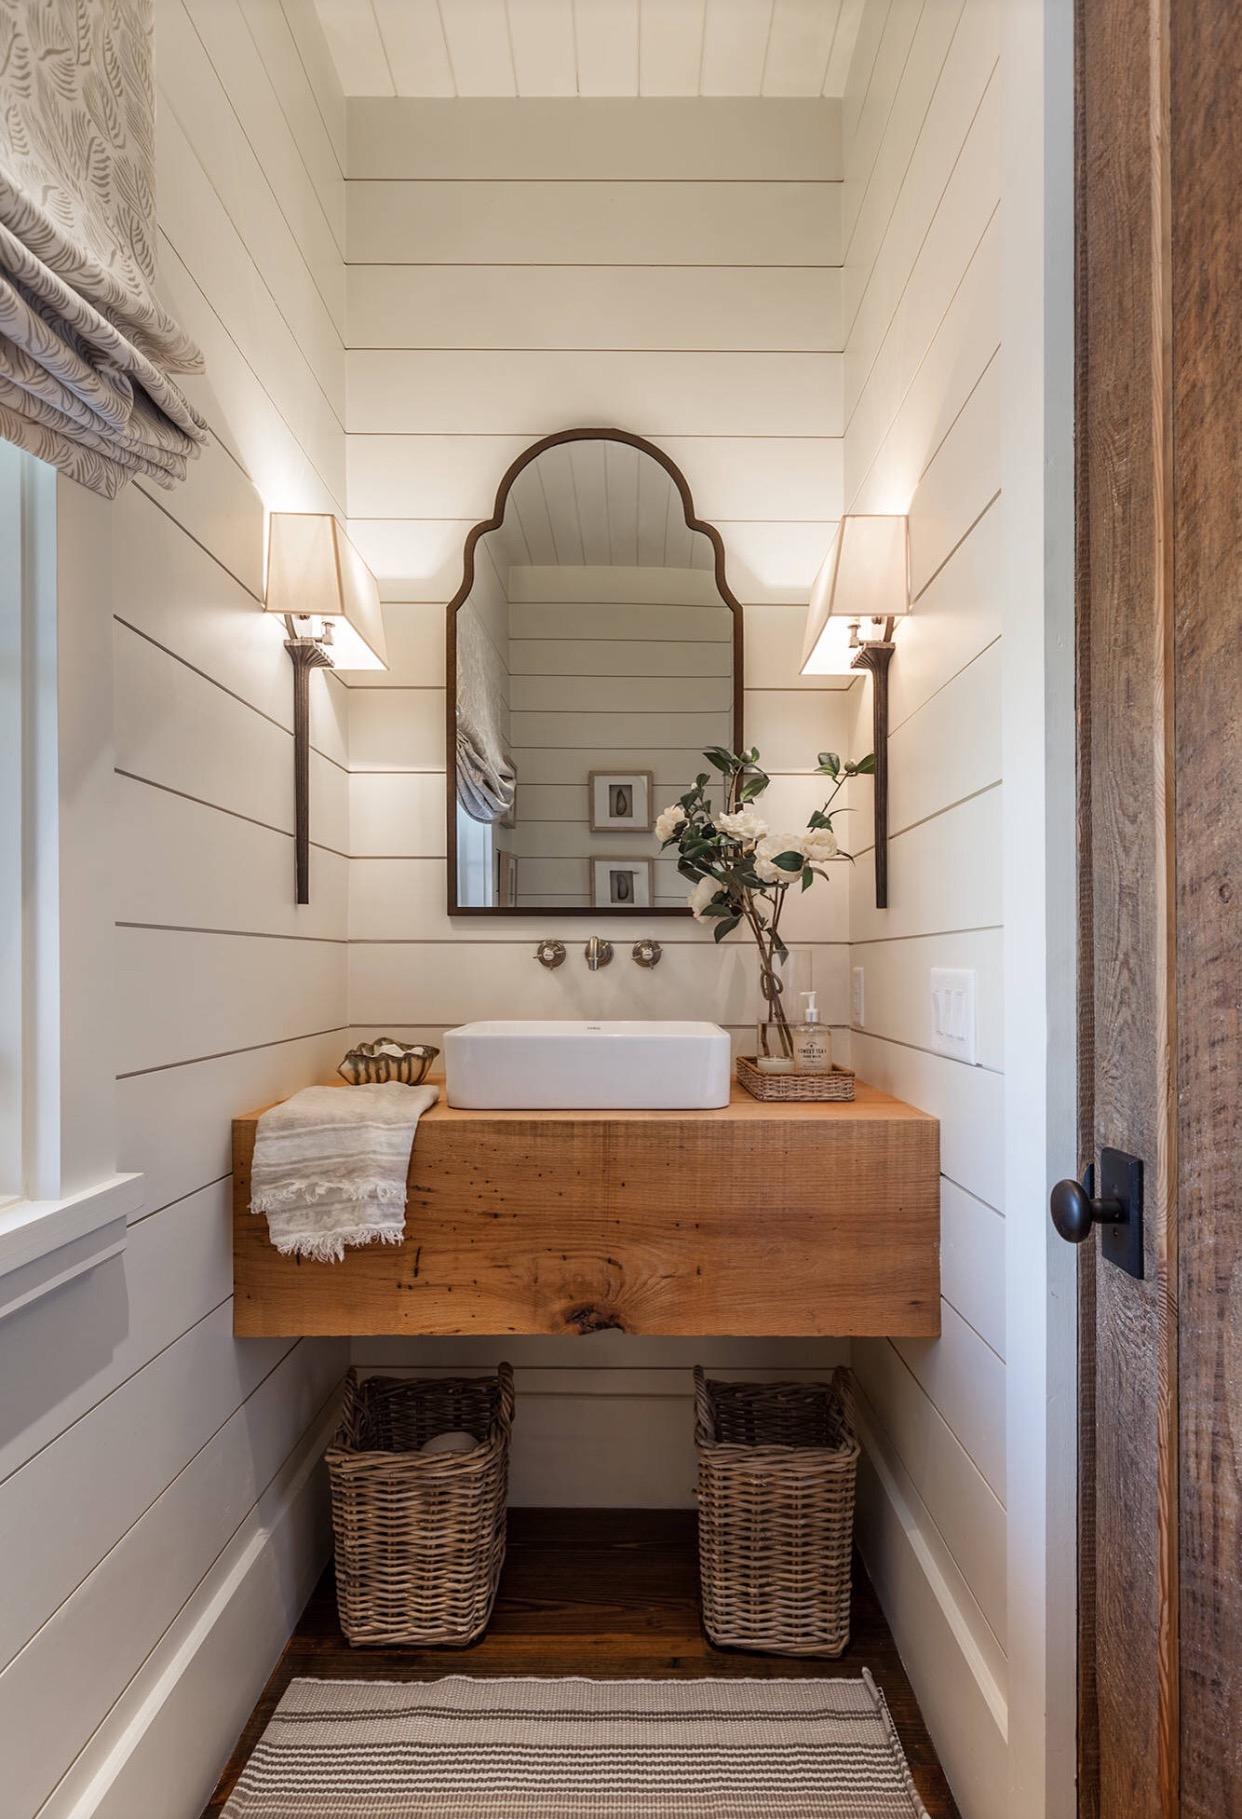 Shiplap Powder Bathroom with Rustic vanity, vessel sink, and shiplap walls